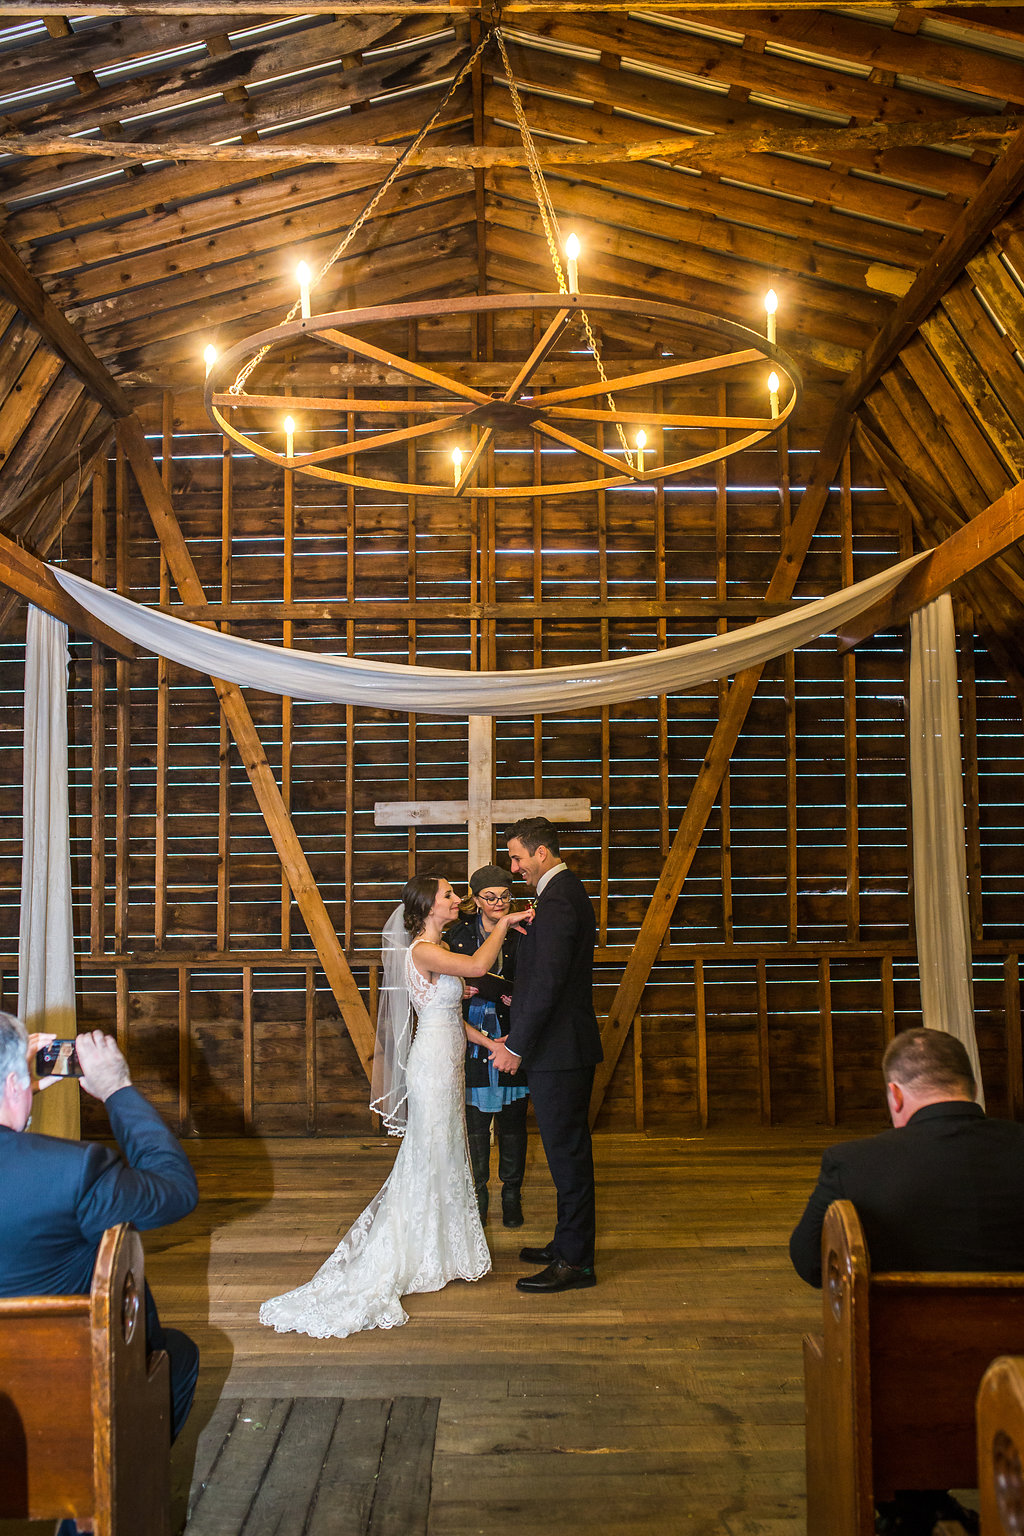 Honeysuckle-Hill-Asheville-Wedding-Venue-Chase-Chris-Elopement-166.JPG